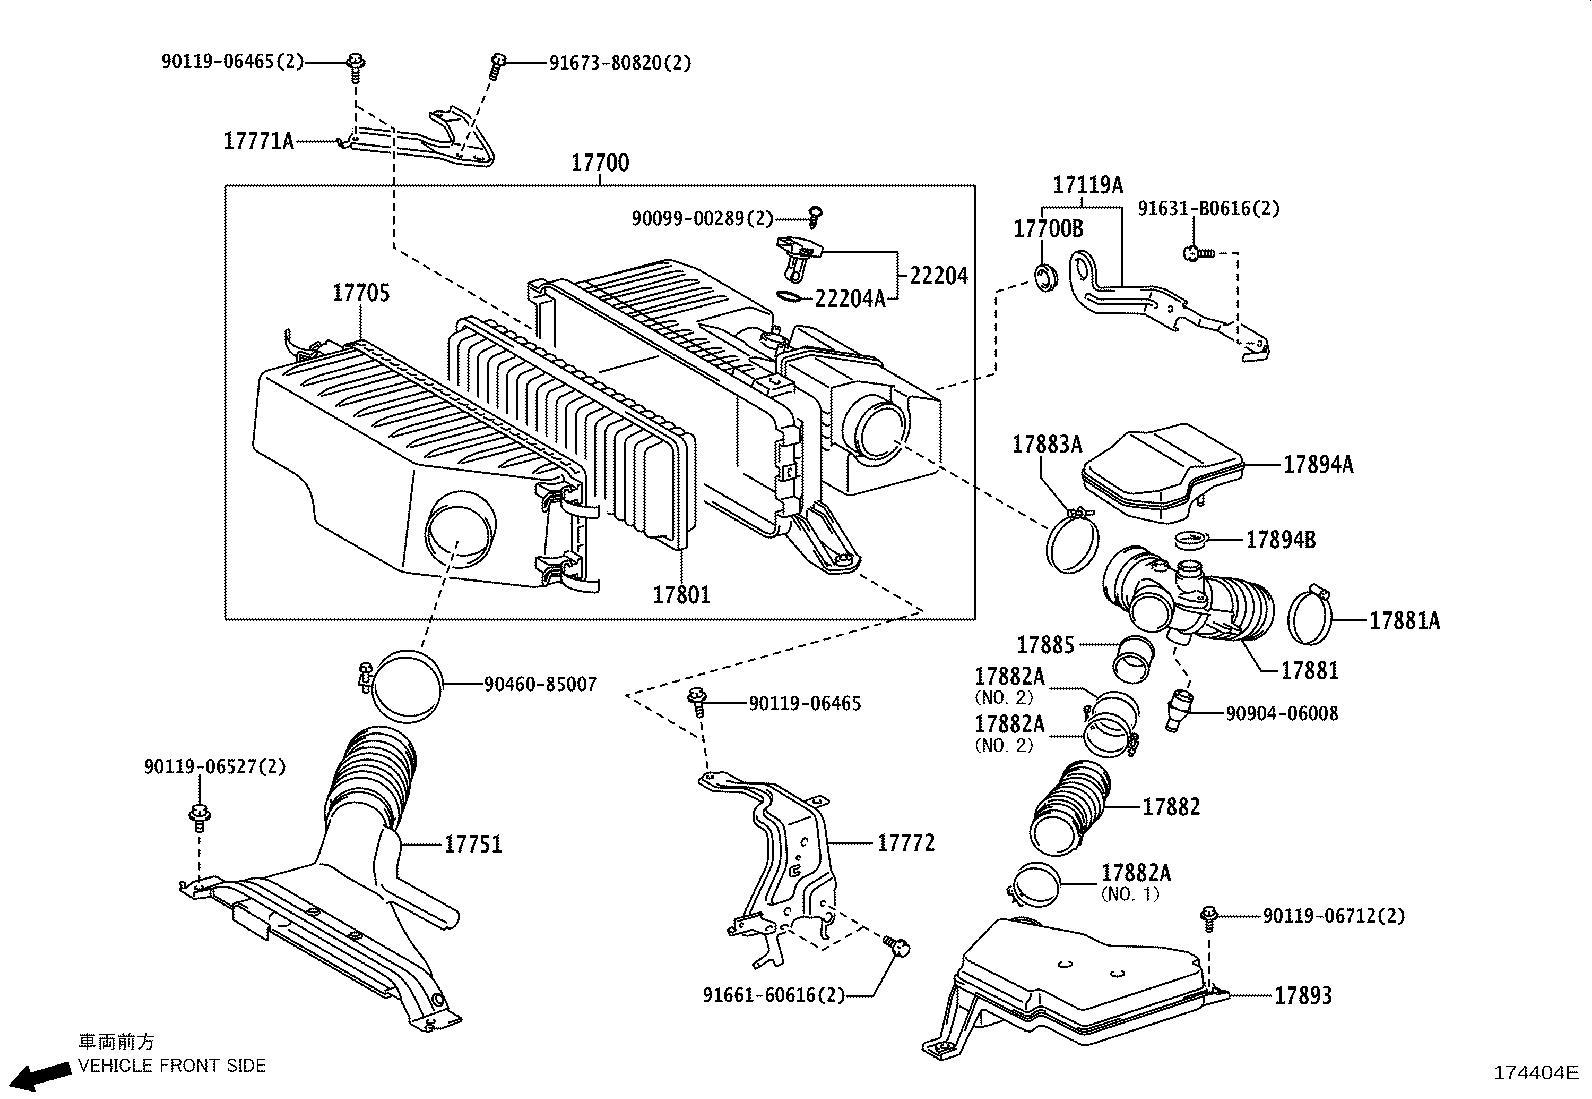 Lexus Rx 400h Engine Air Duct Clamp